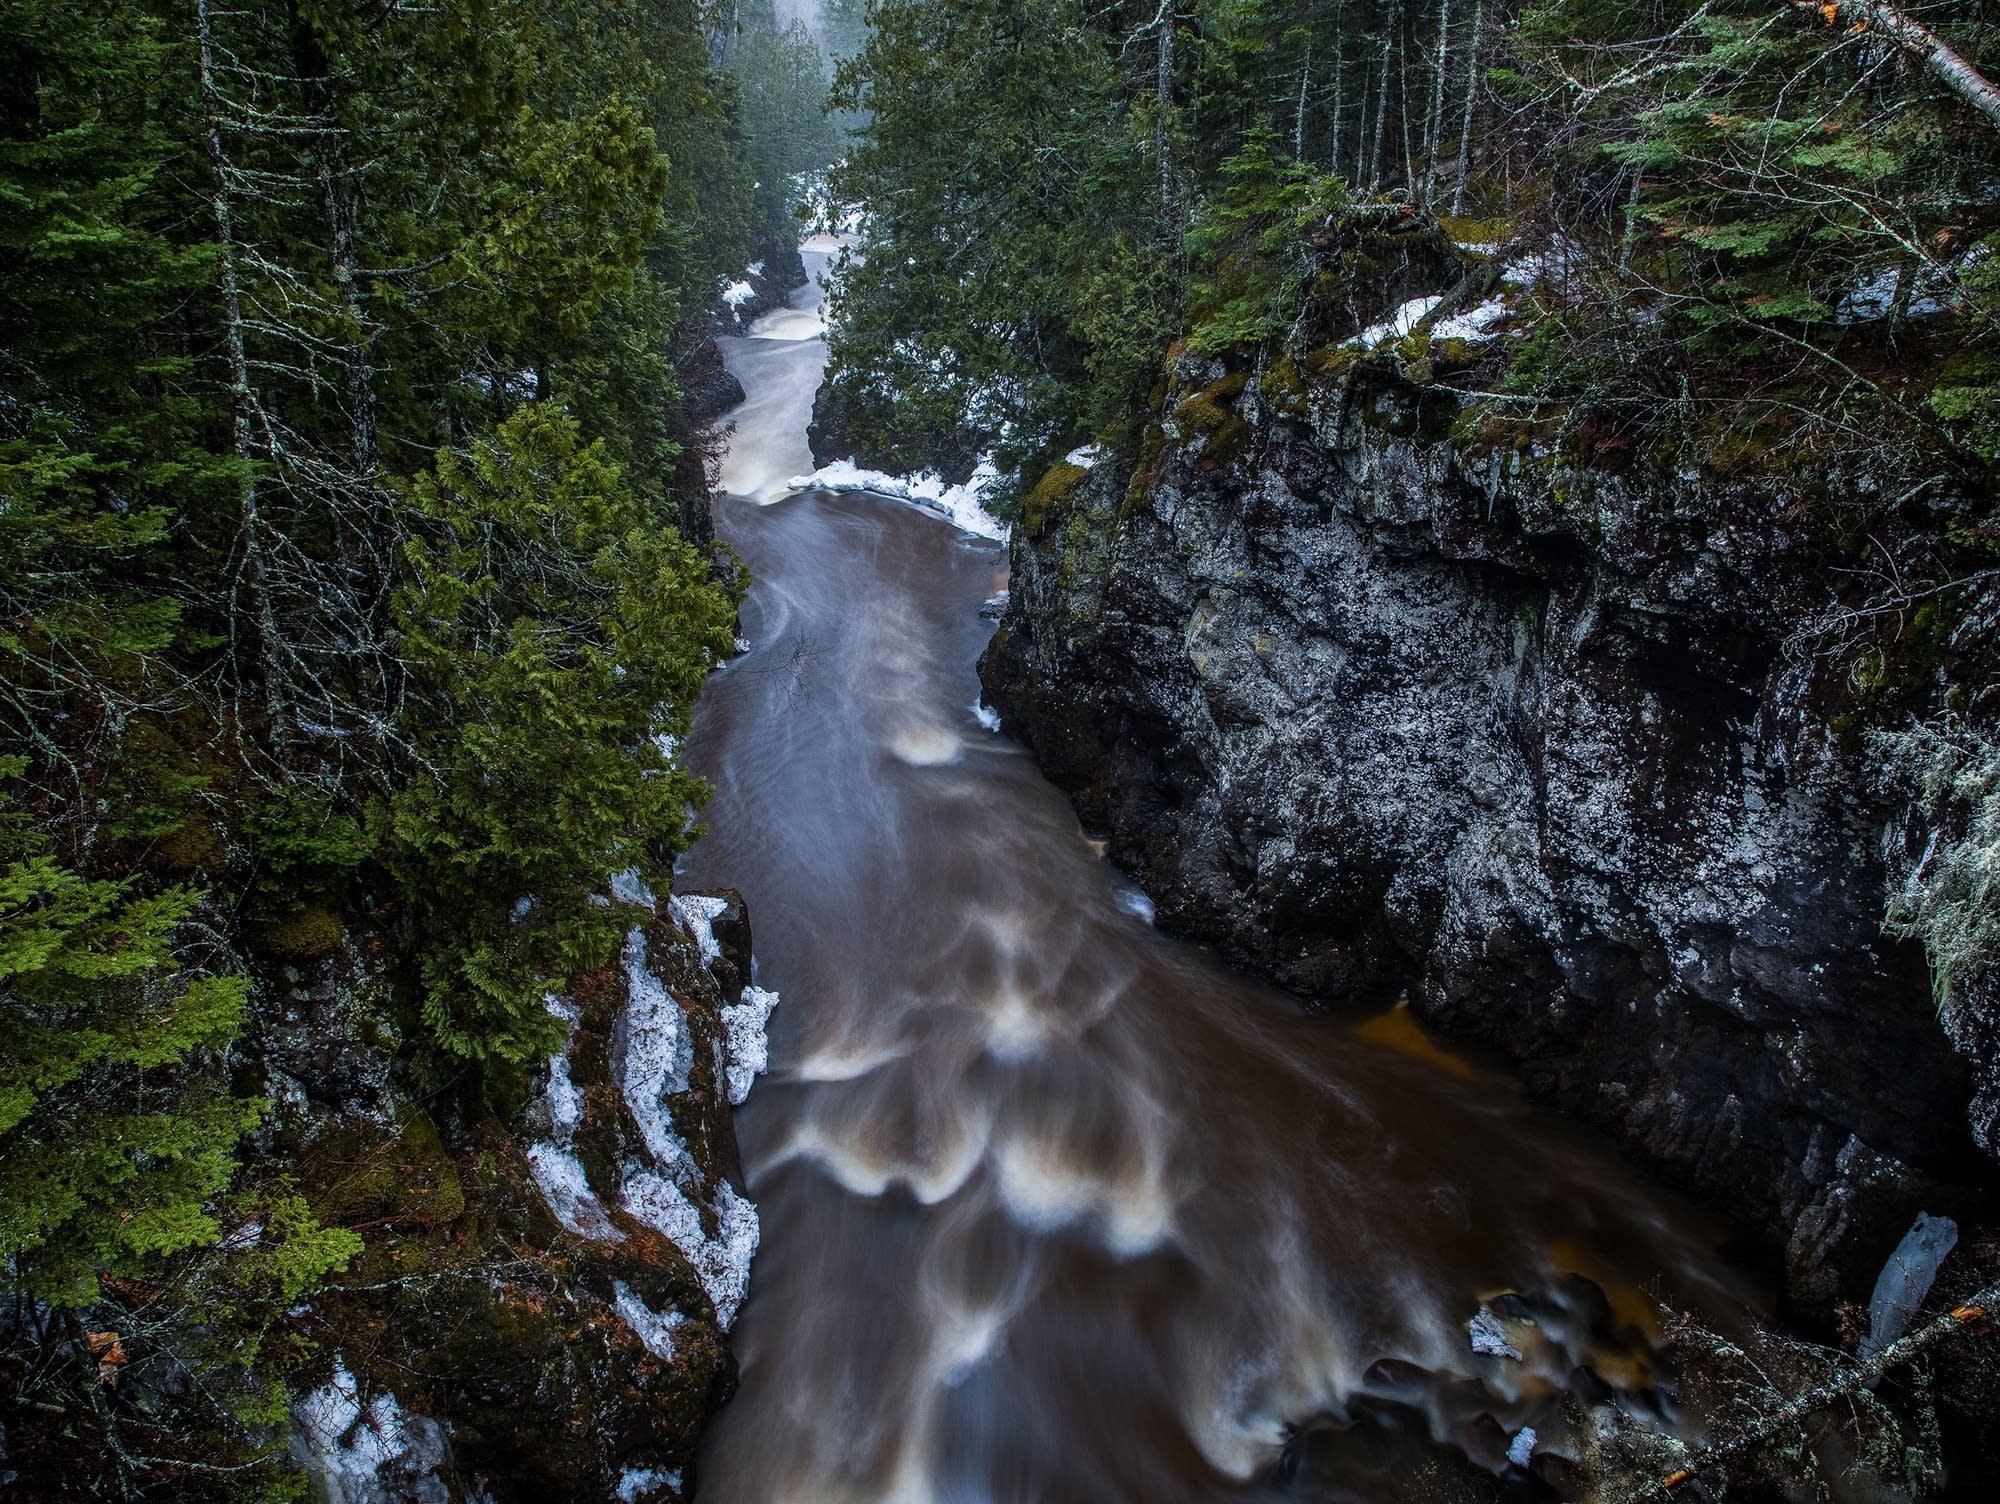 The Cascade River makes its way through a gorge